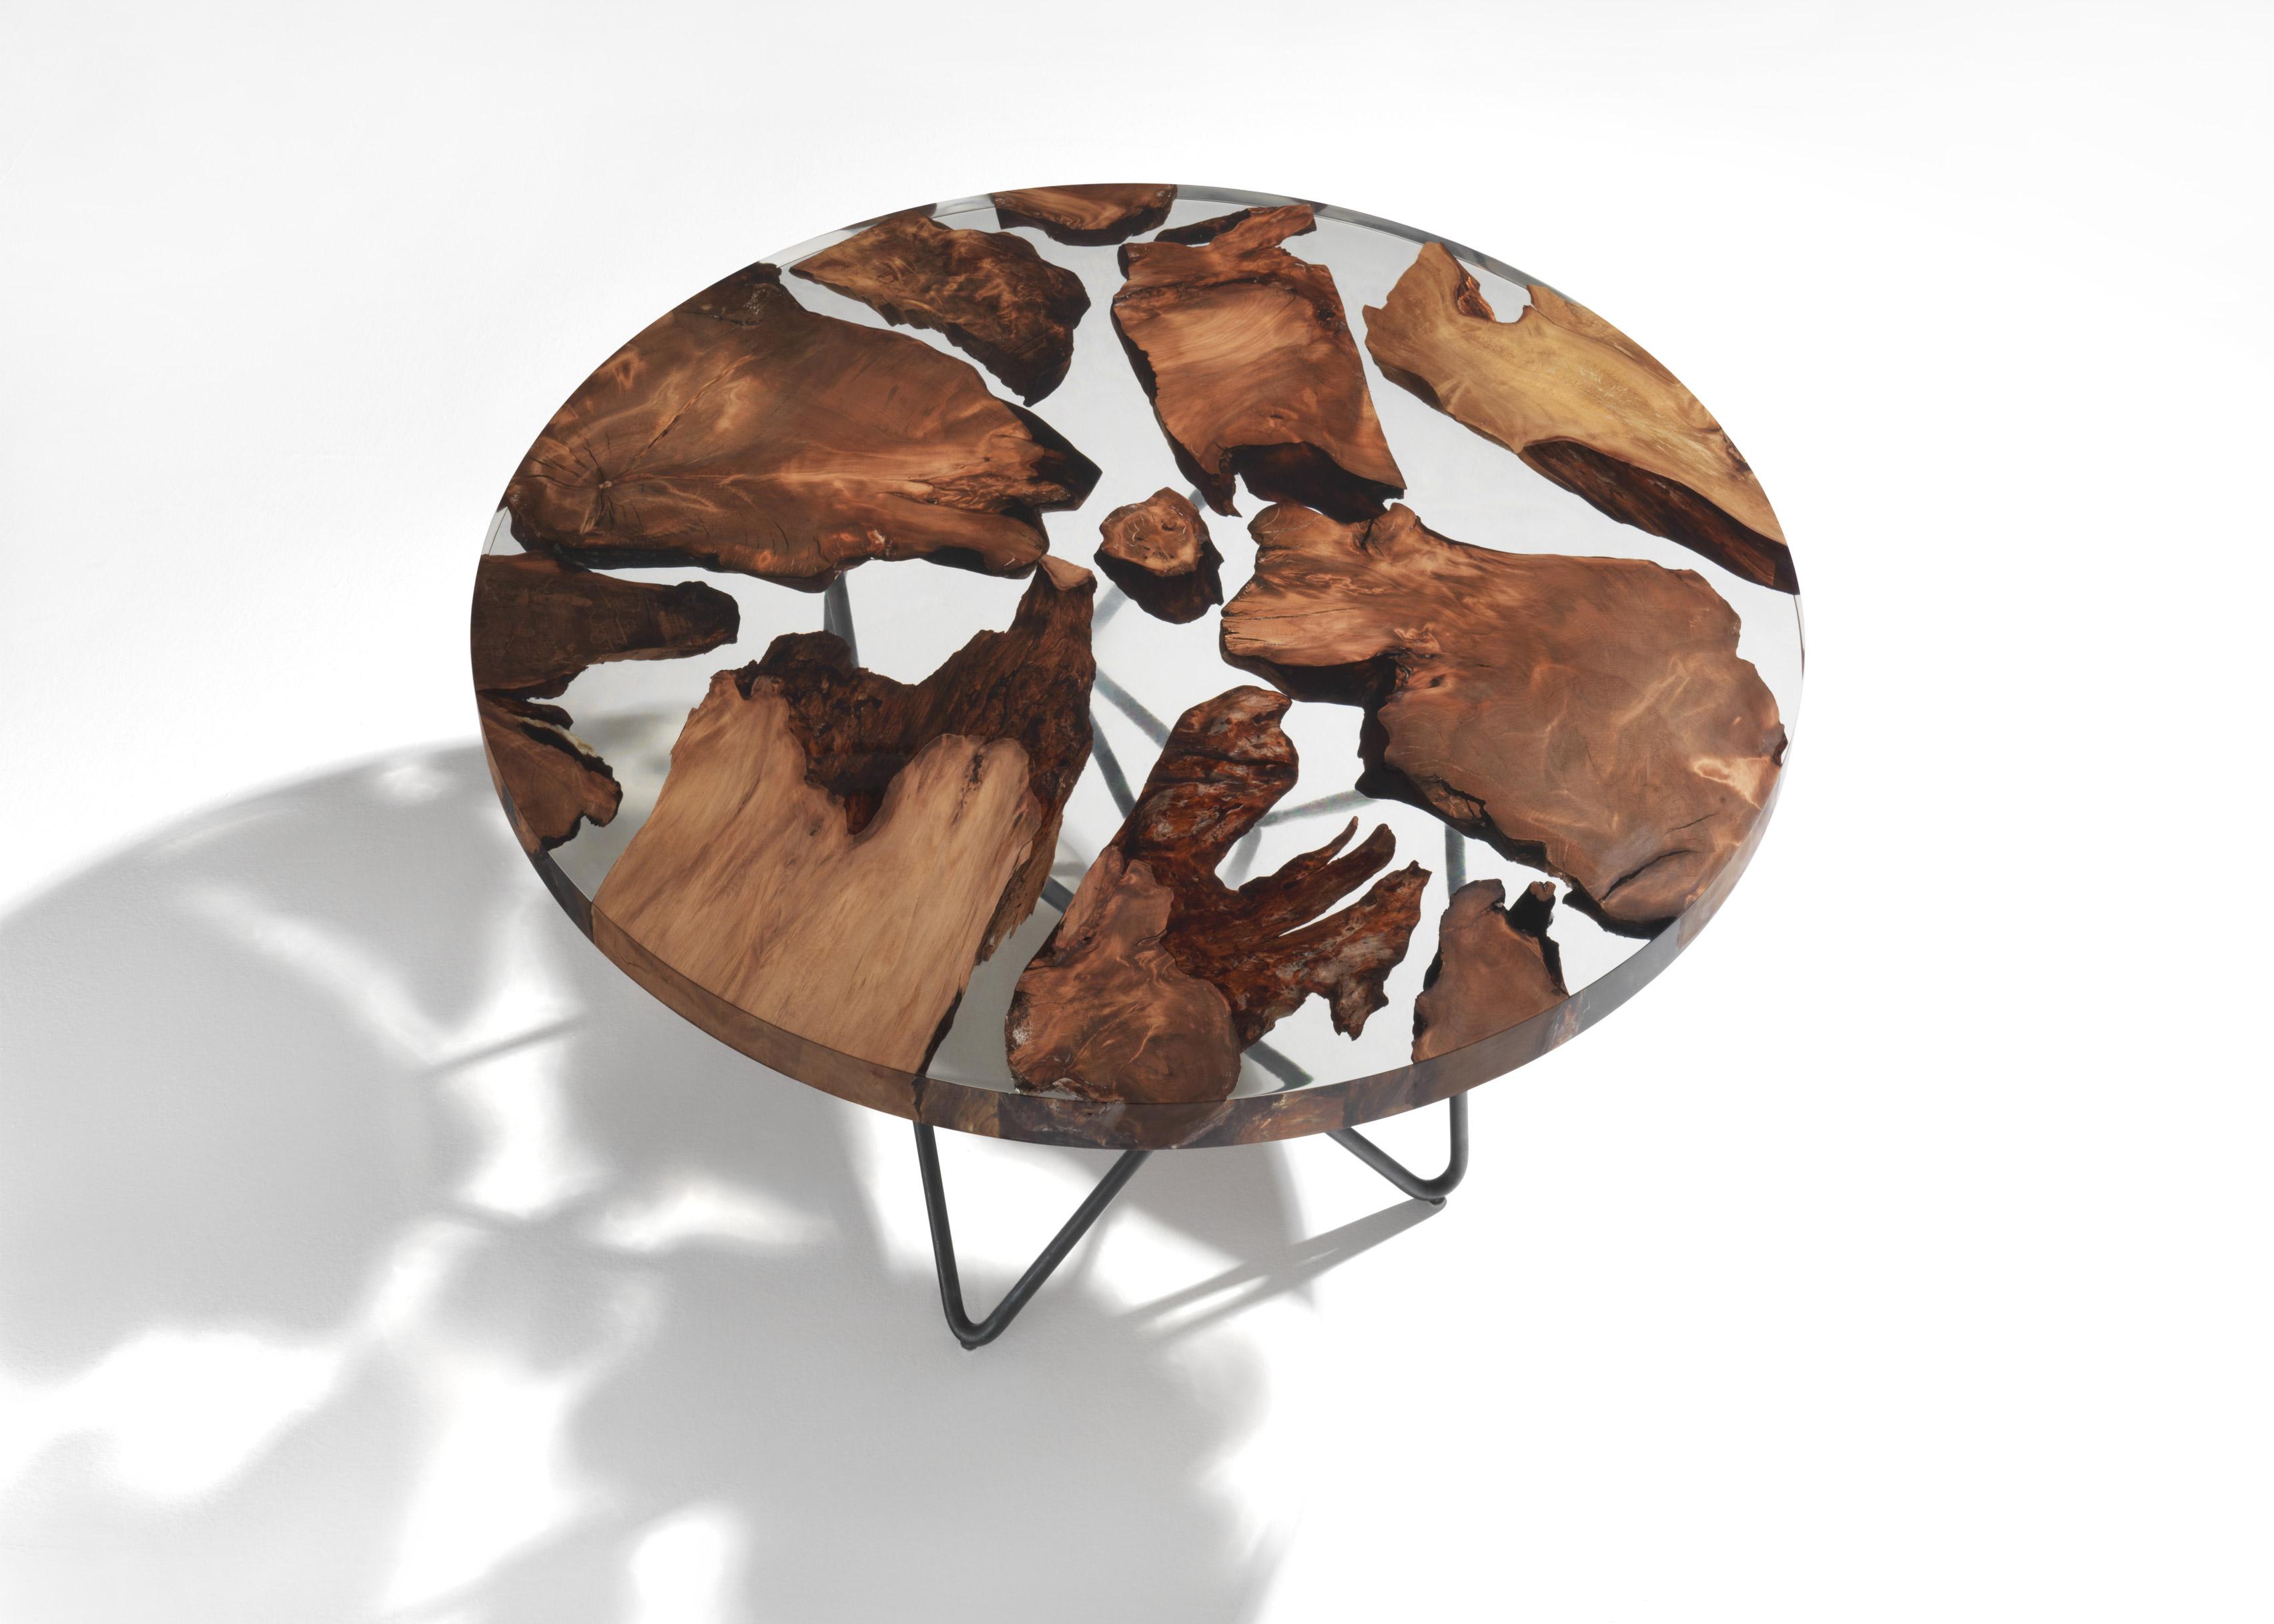 Amazing Renzo Piano Designs Symbolic Table For World Trade Center Download Free Architecture Designs Scobabritishbridgeorg